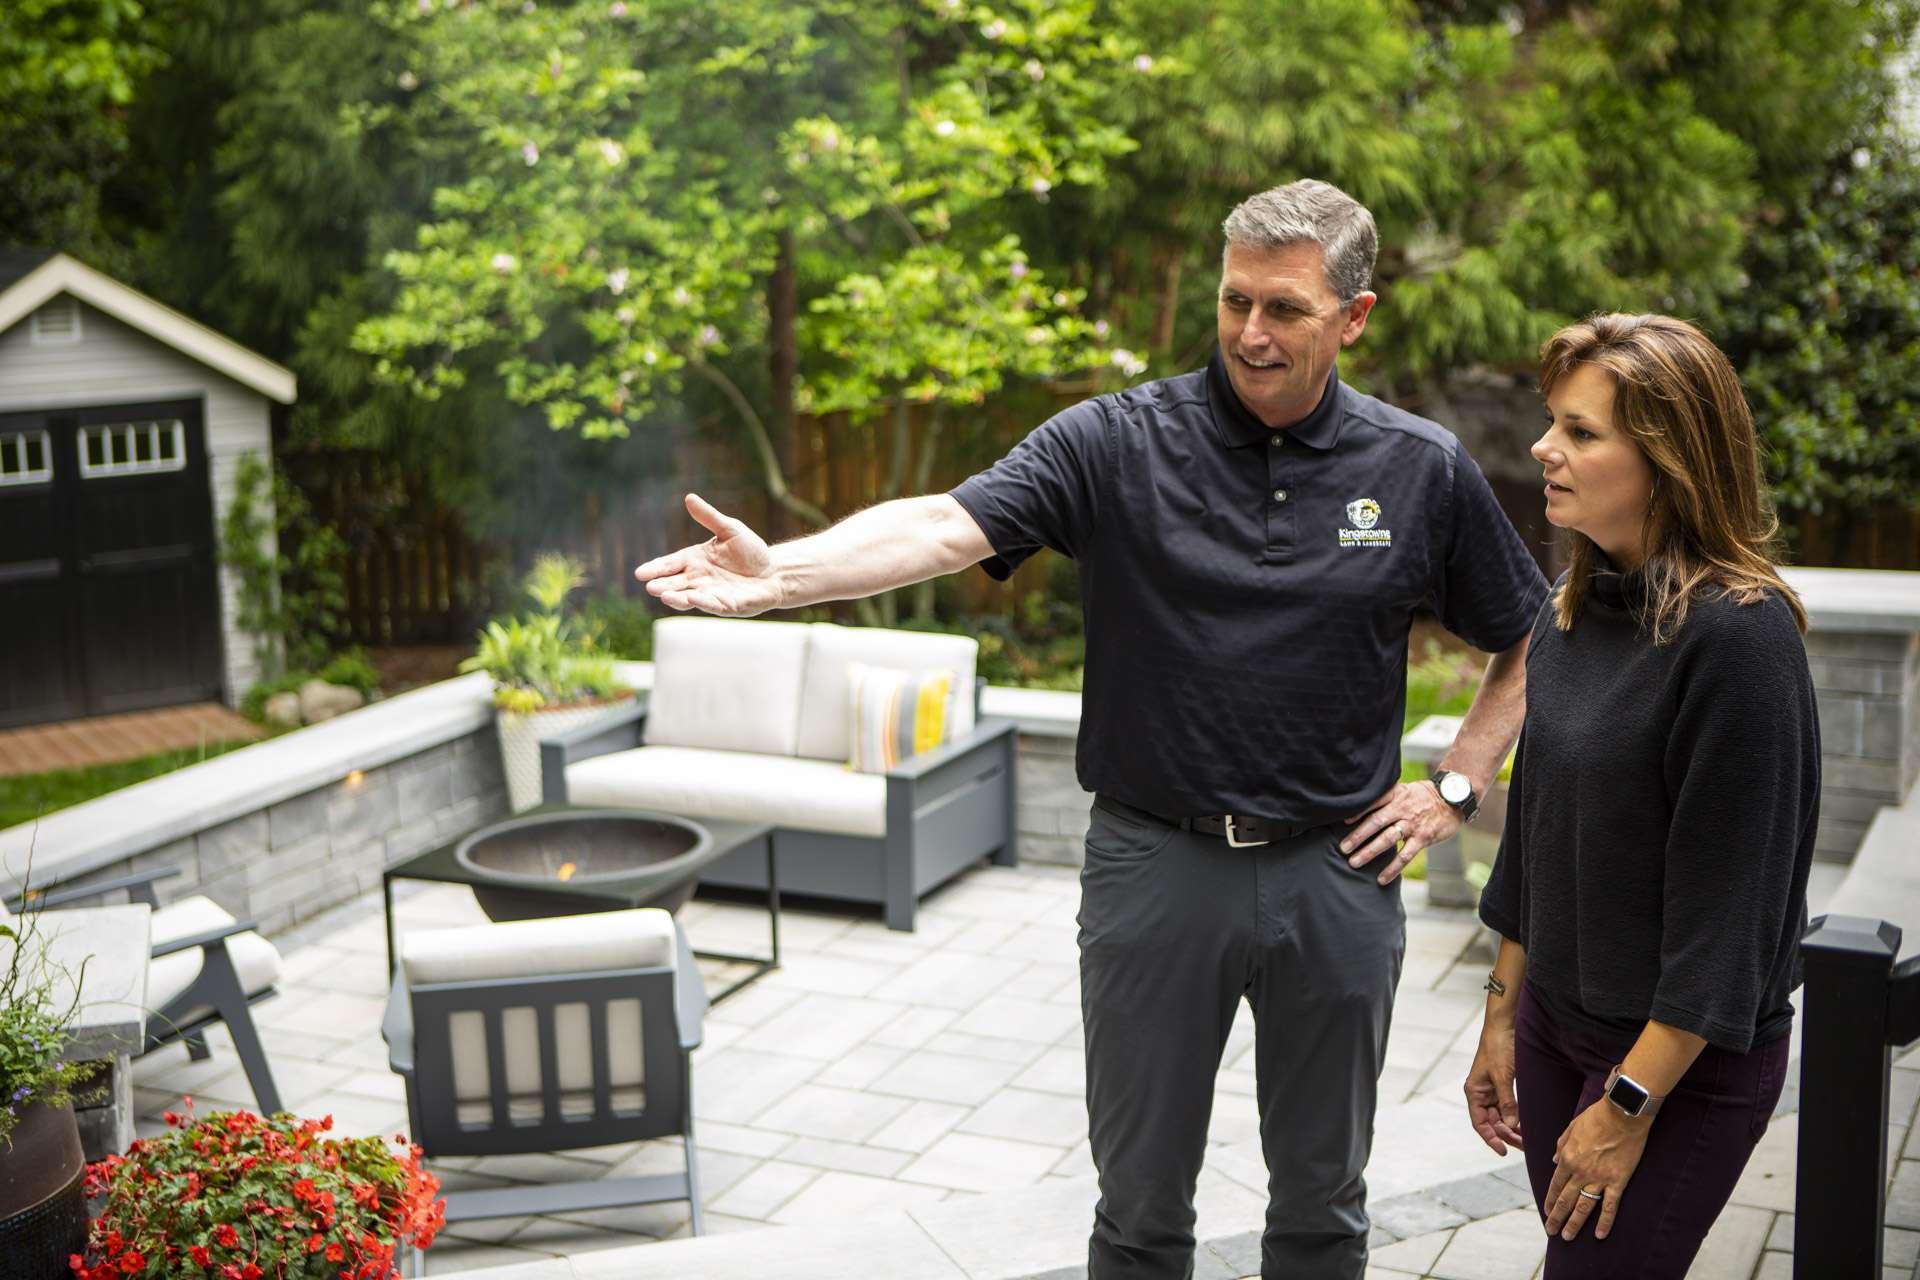 landscape-designer-customer-patio-fire-pit-2